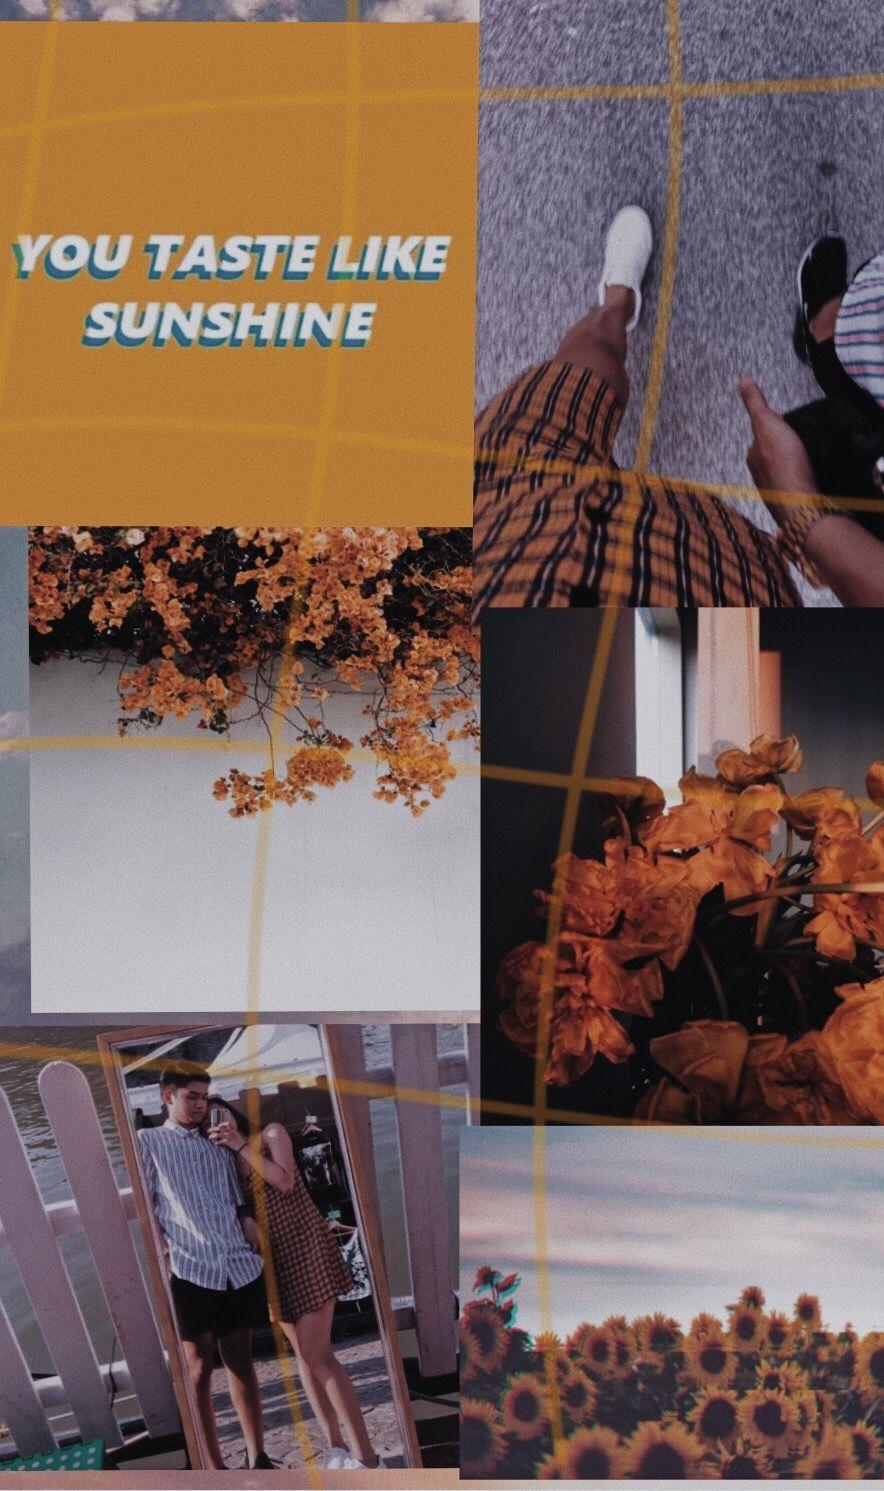 Aesthetic Indie Wallpaper Iphone - HD Wallpaper